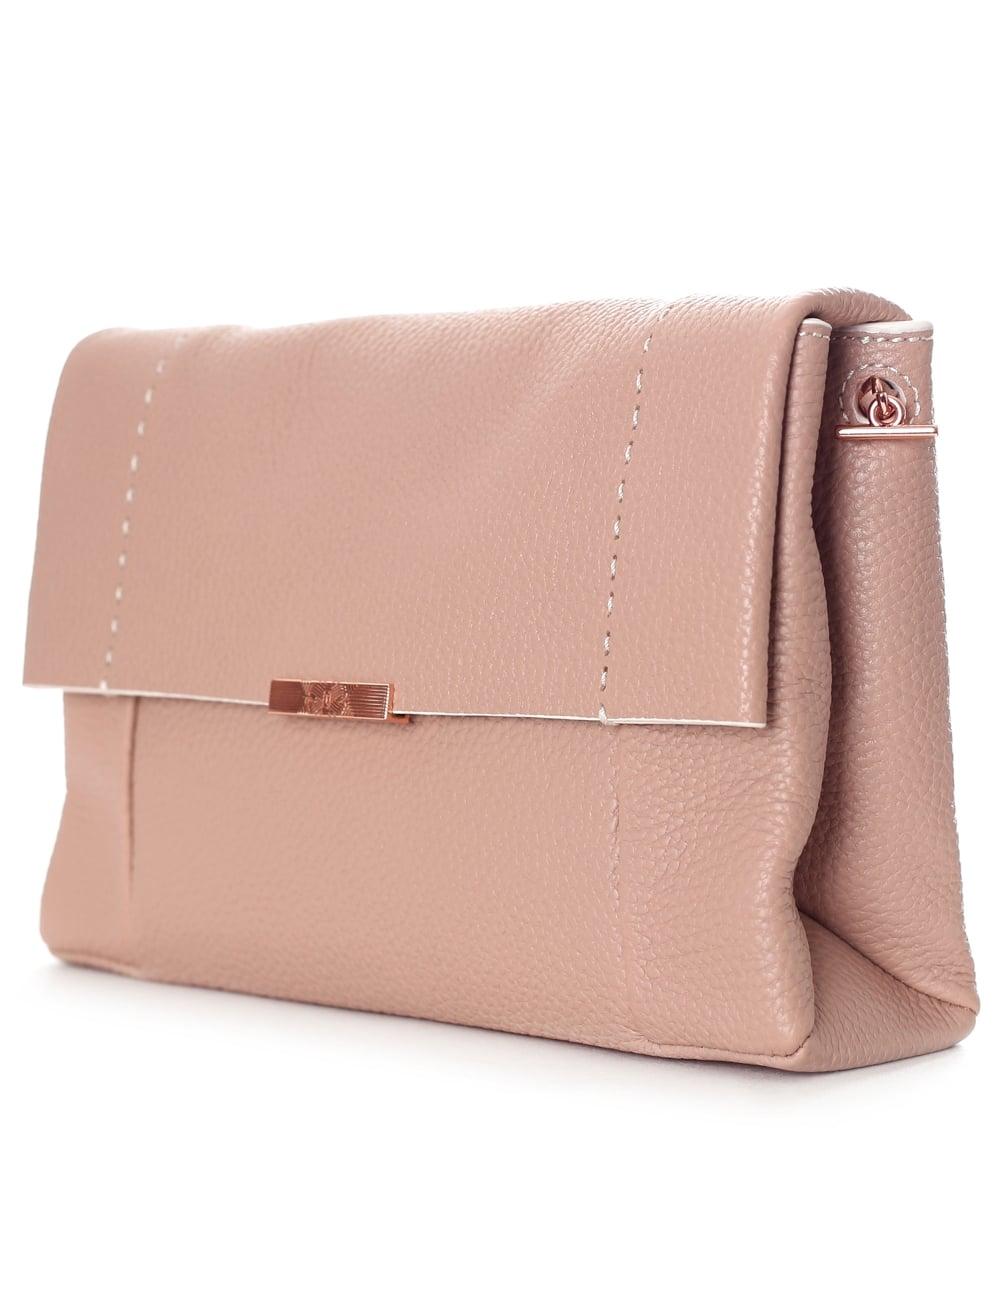 04590cc72 Ted Baker Parson Women s Soft leather Cross Body Bag